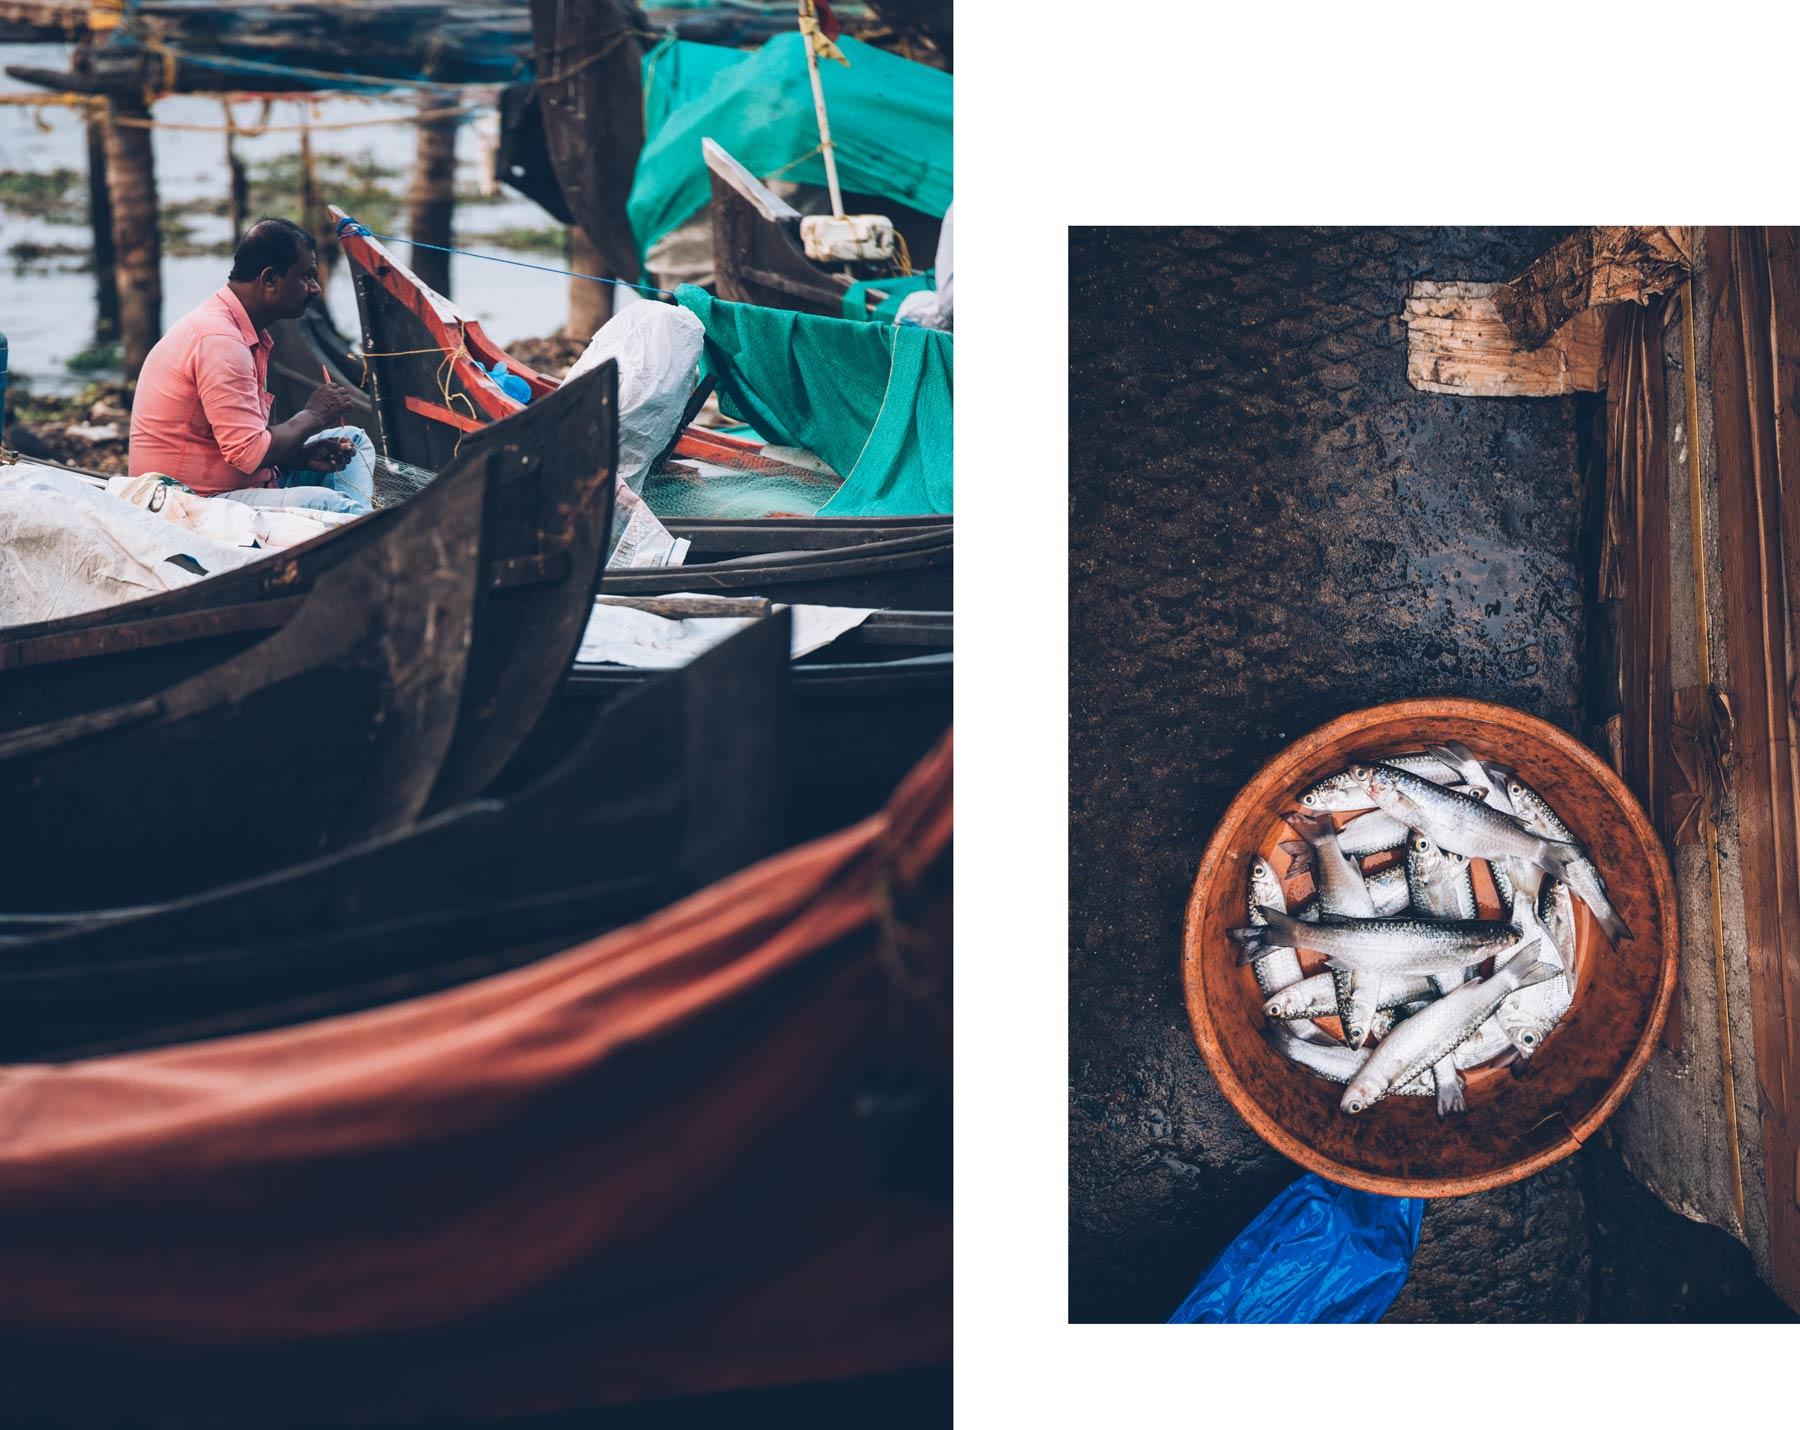 La criée, Cochin